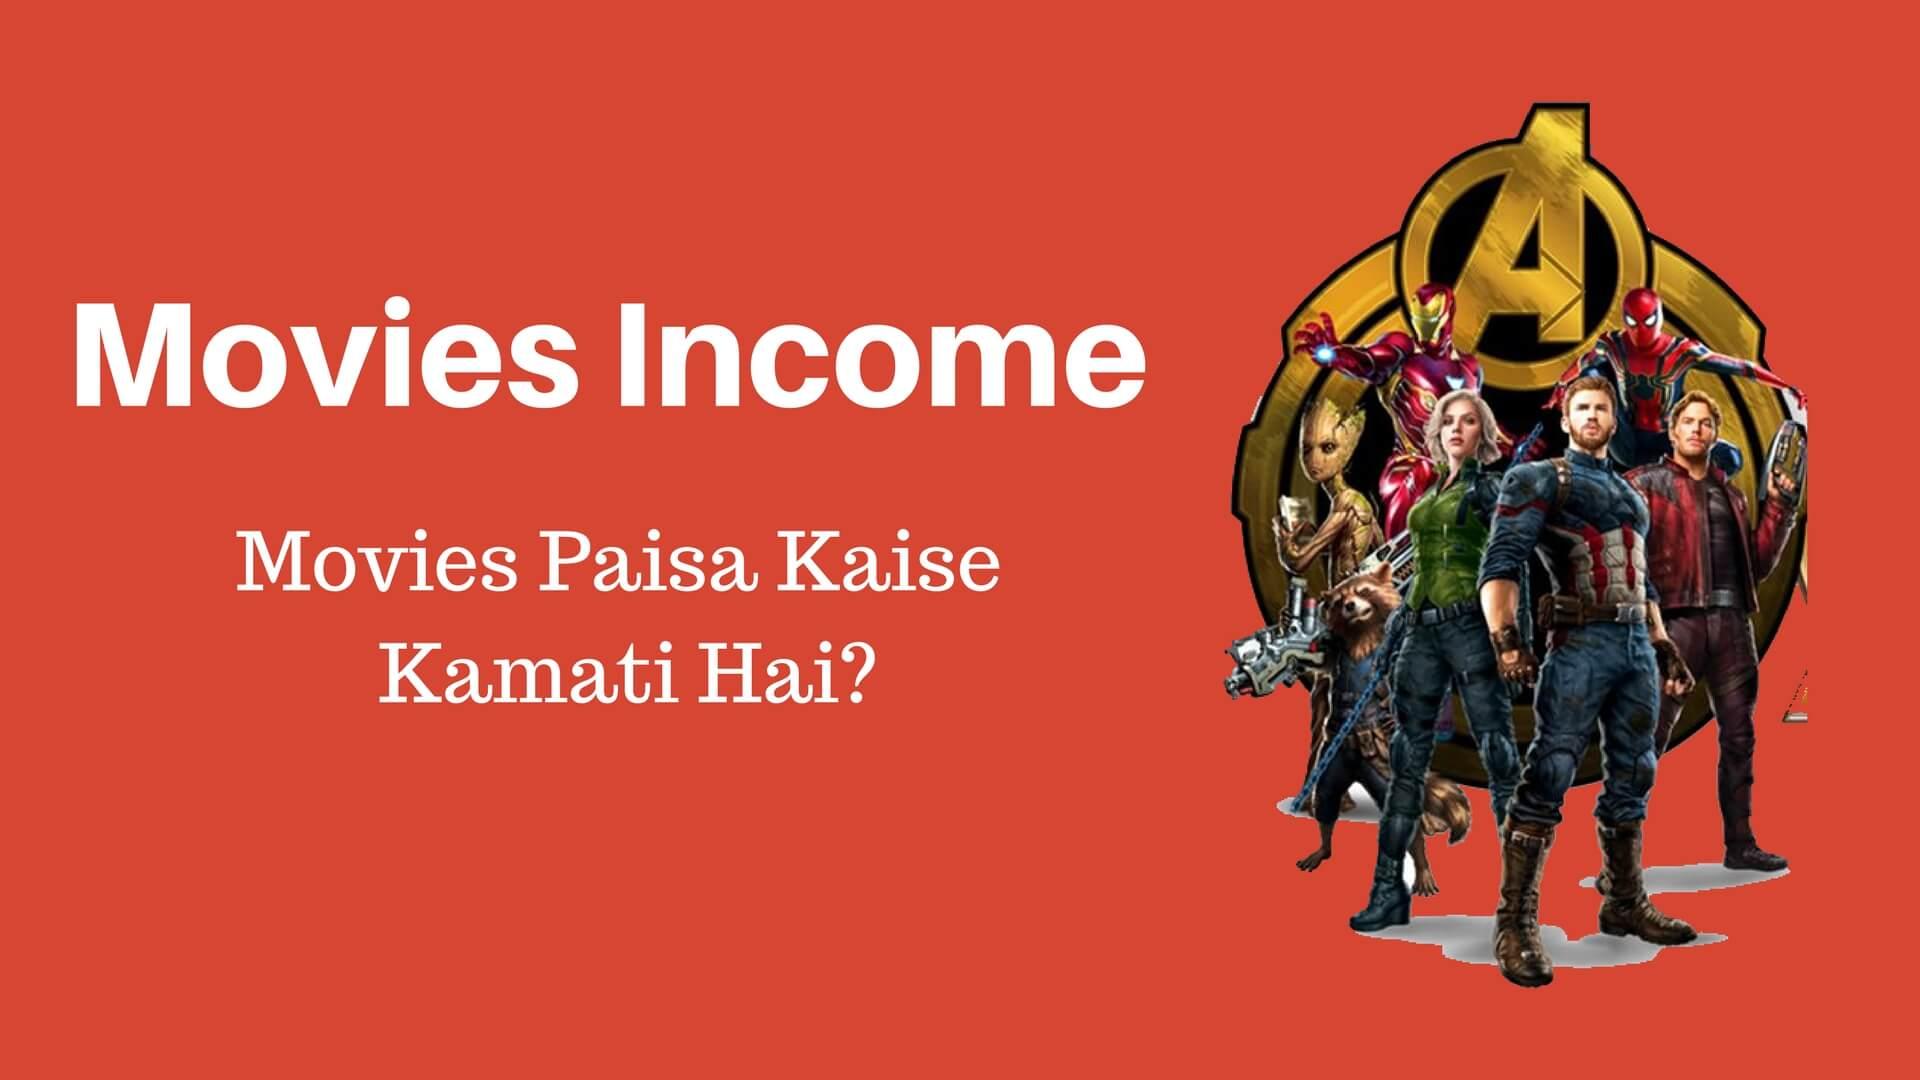 Movies Producer Paisa Kaise Kamate hai